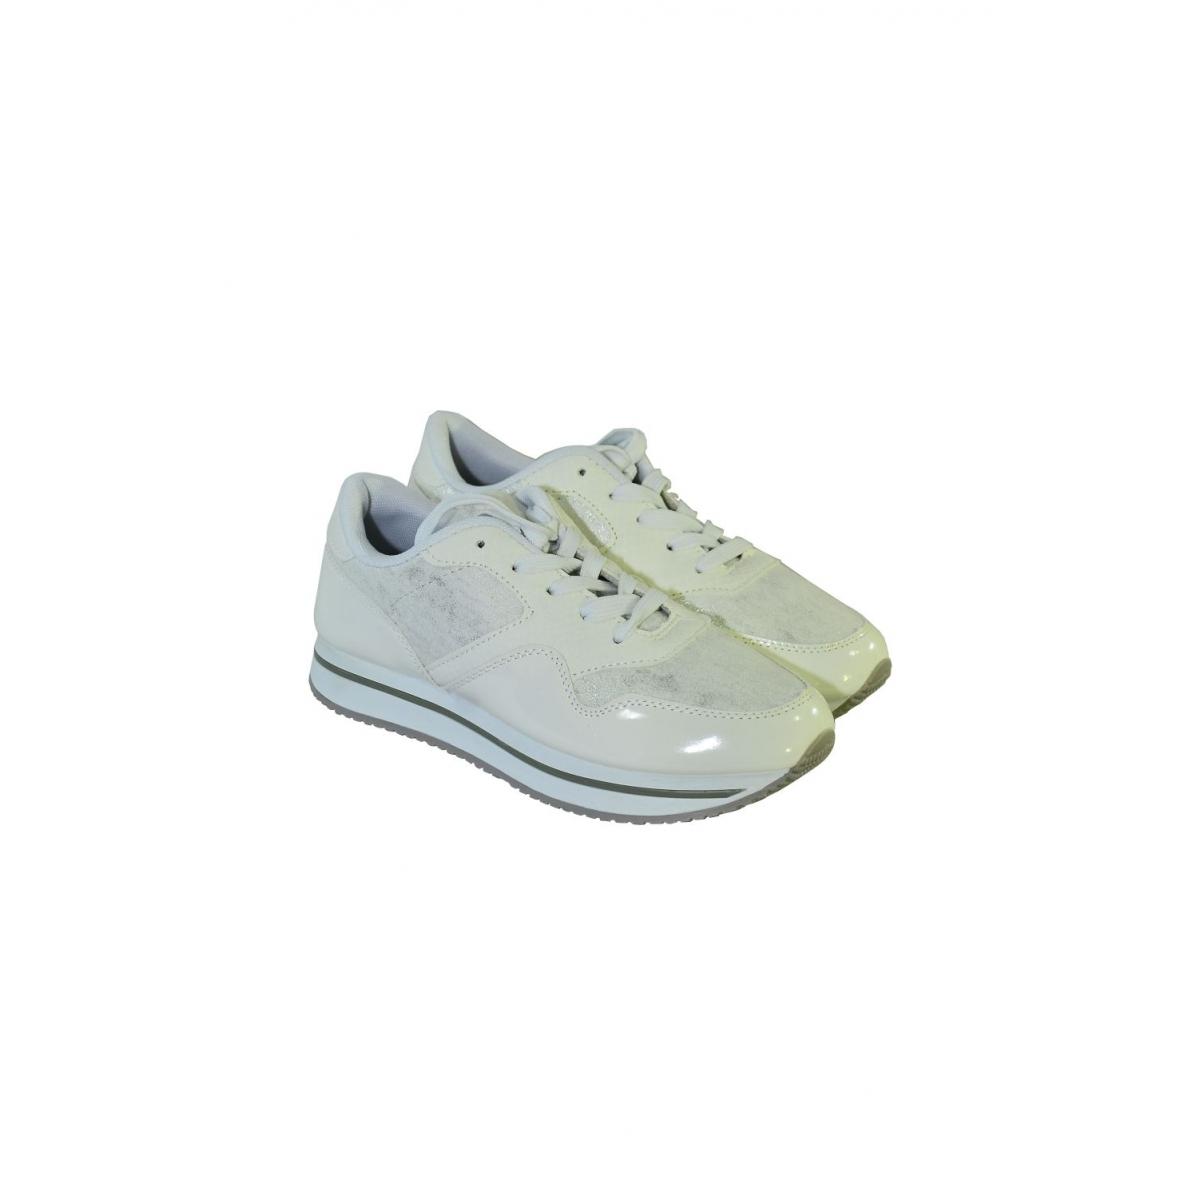 83af60f09c73 Dámske biele tenisky MERCA - 2